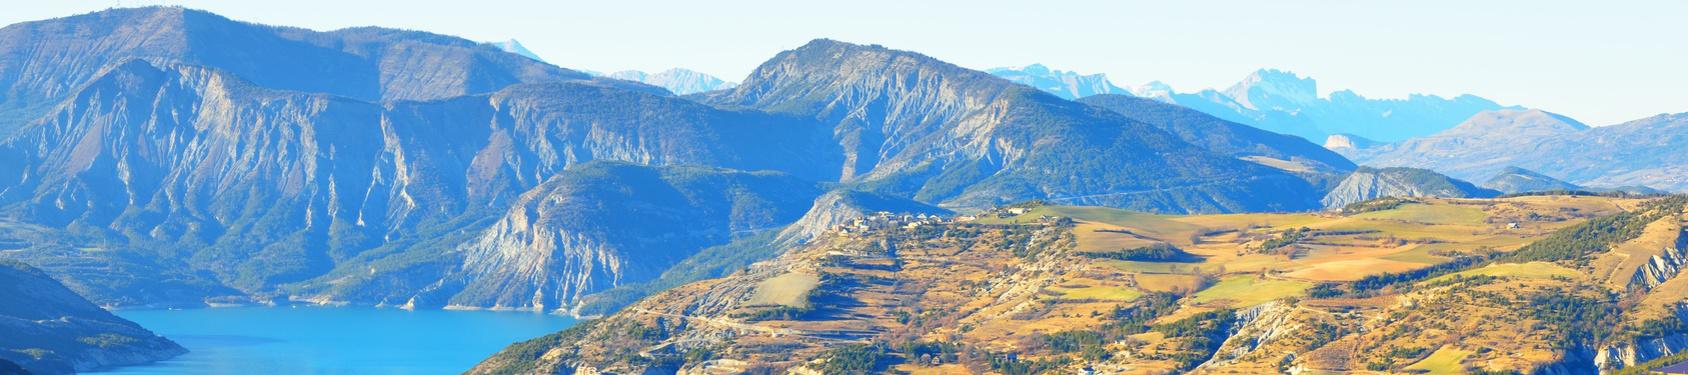 Bild von Alpes-de-Haute-Provence